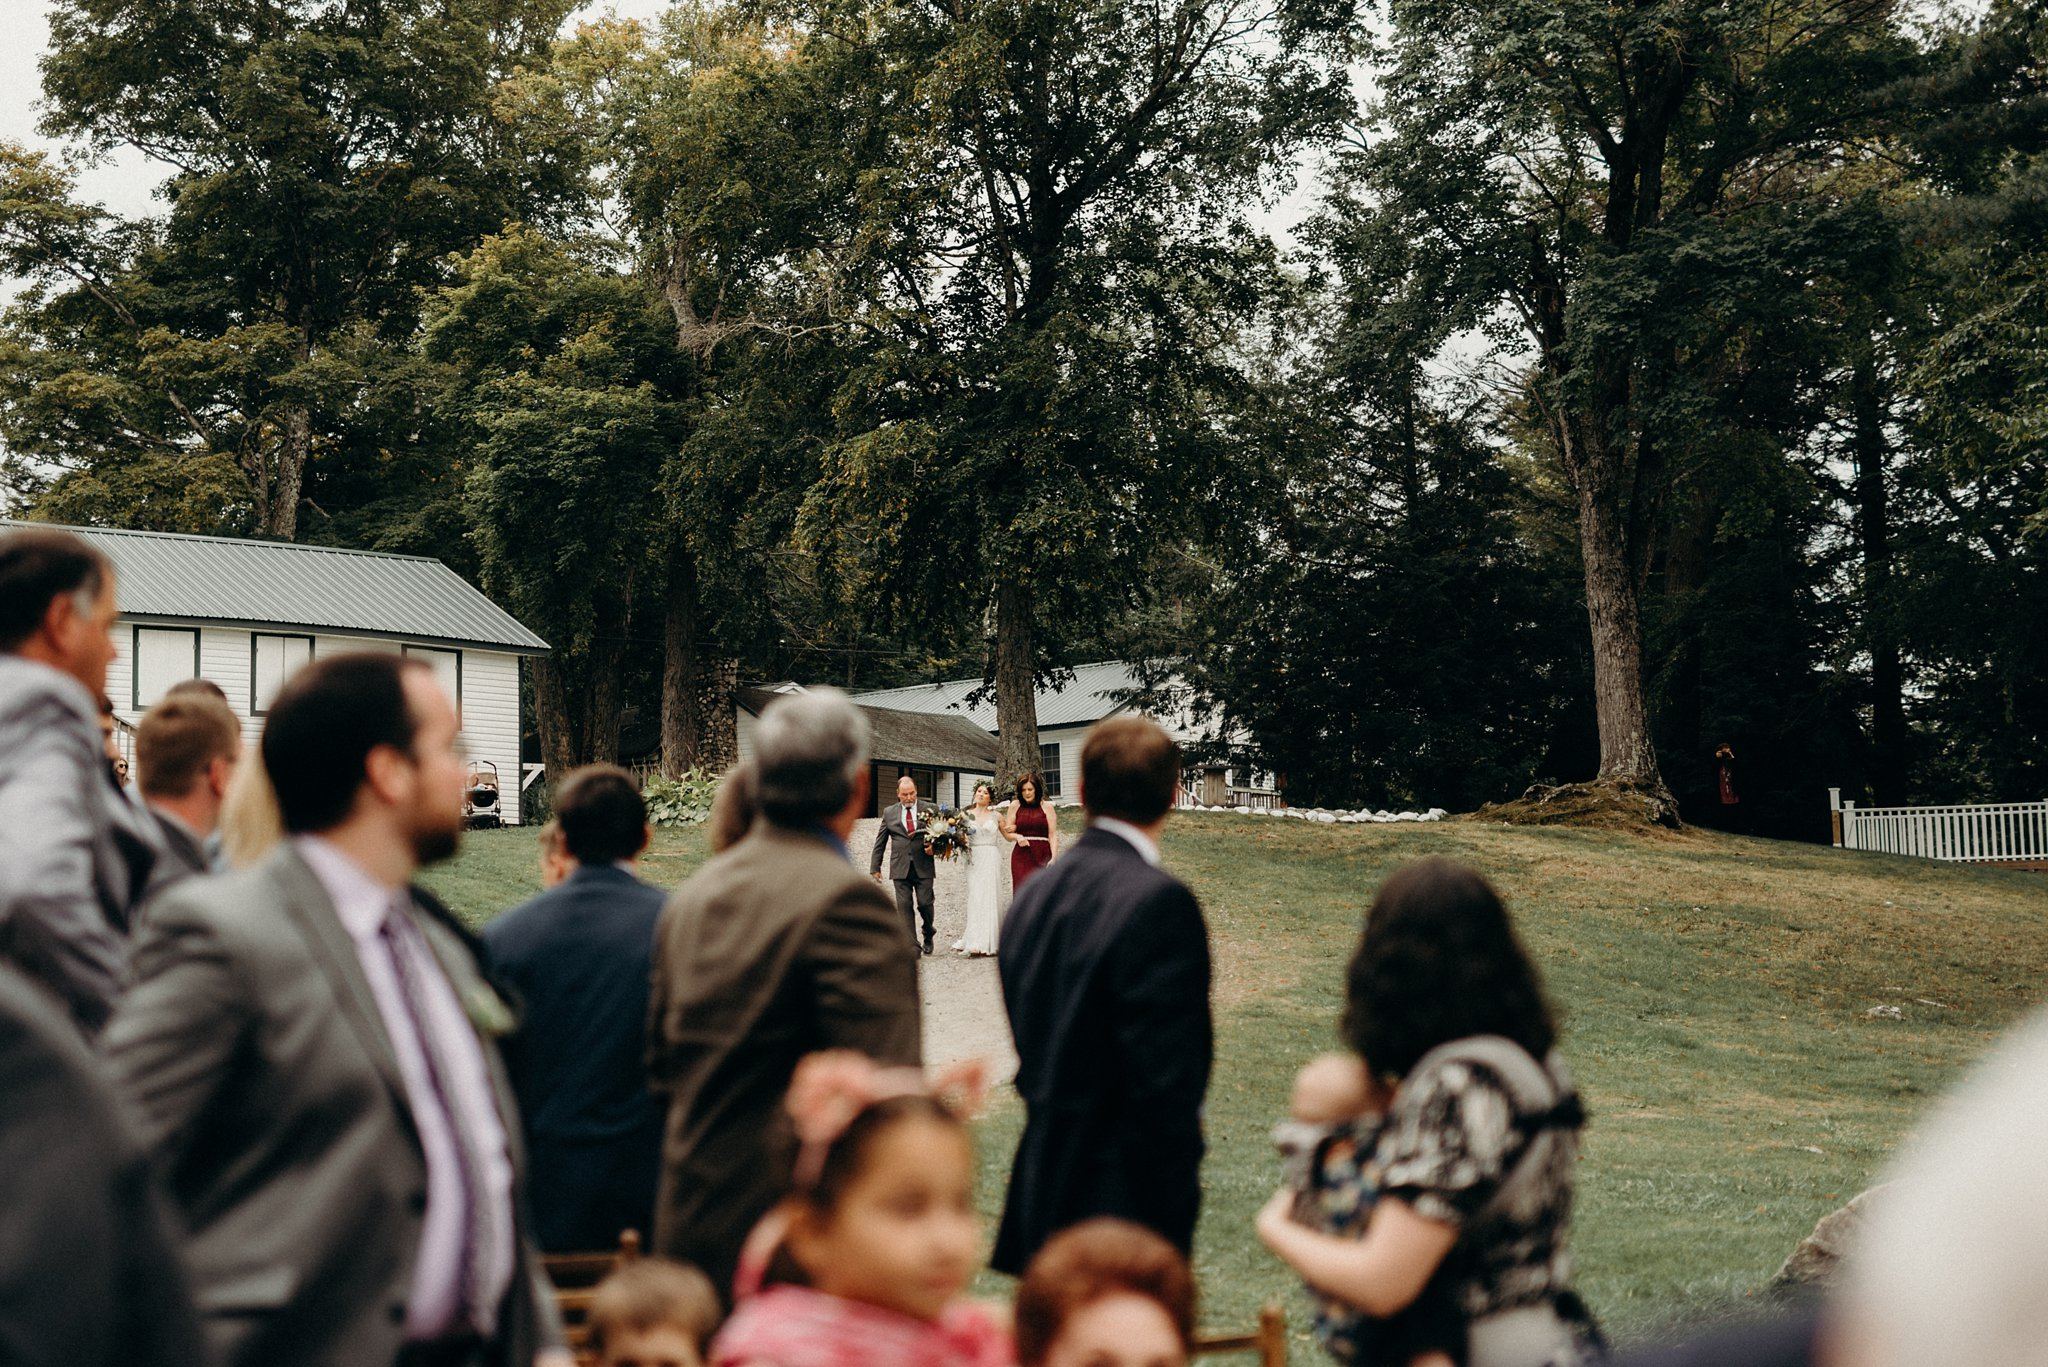 kaihla_tonai_intimate_wedding_elopement_photographer_6621.jpg